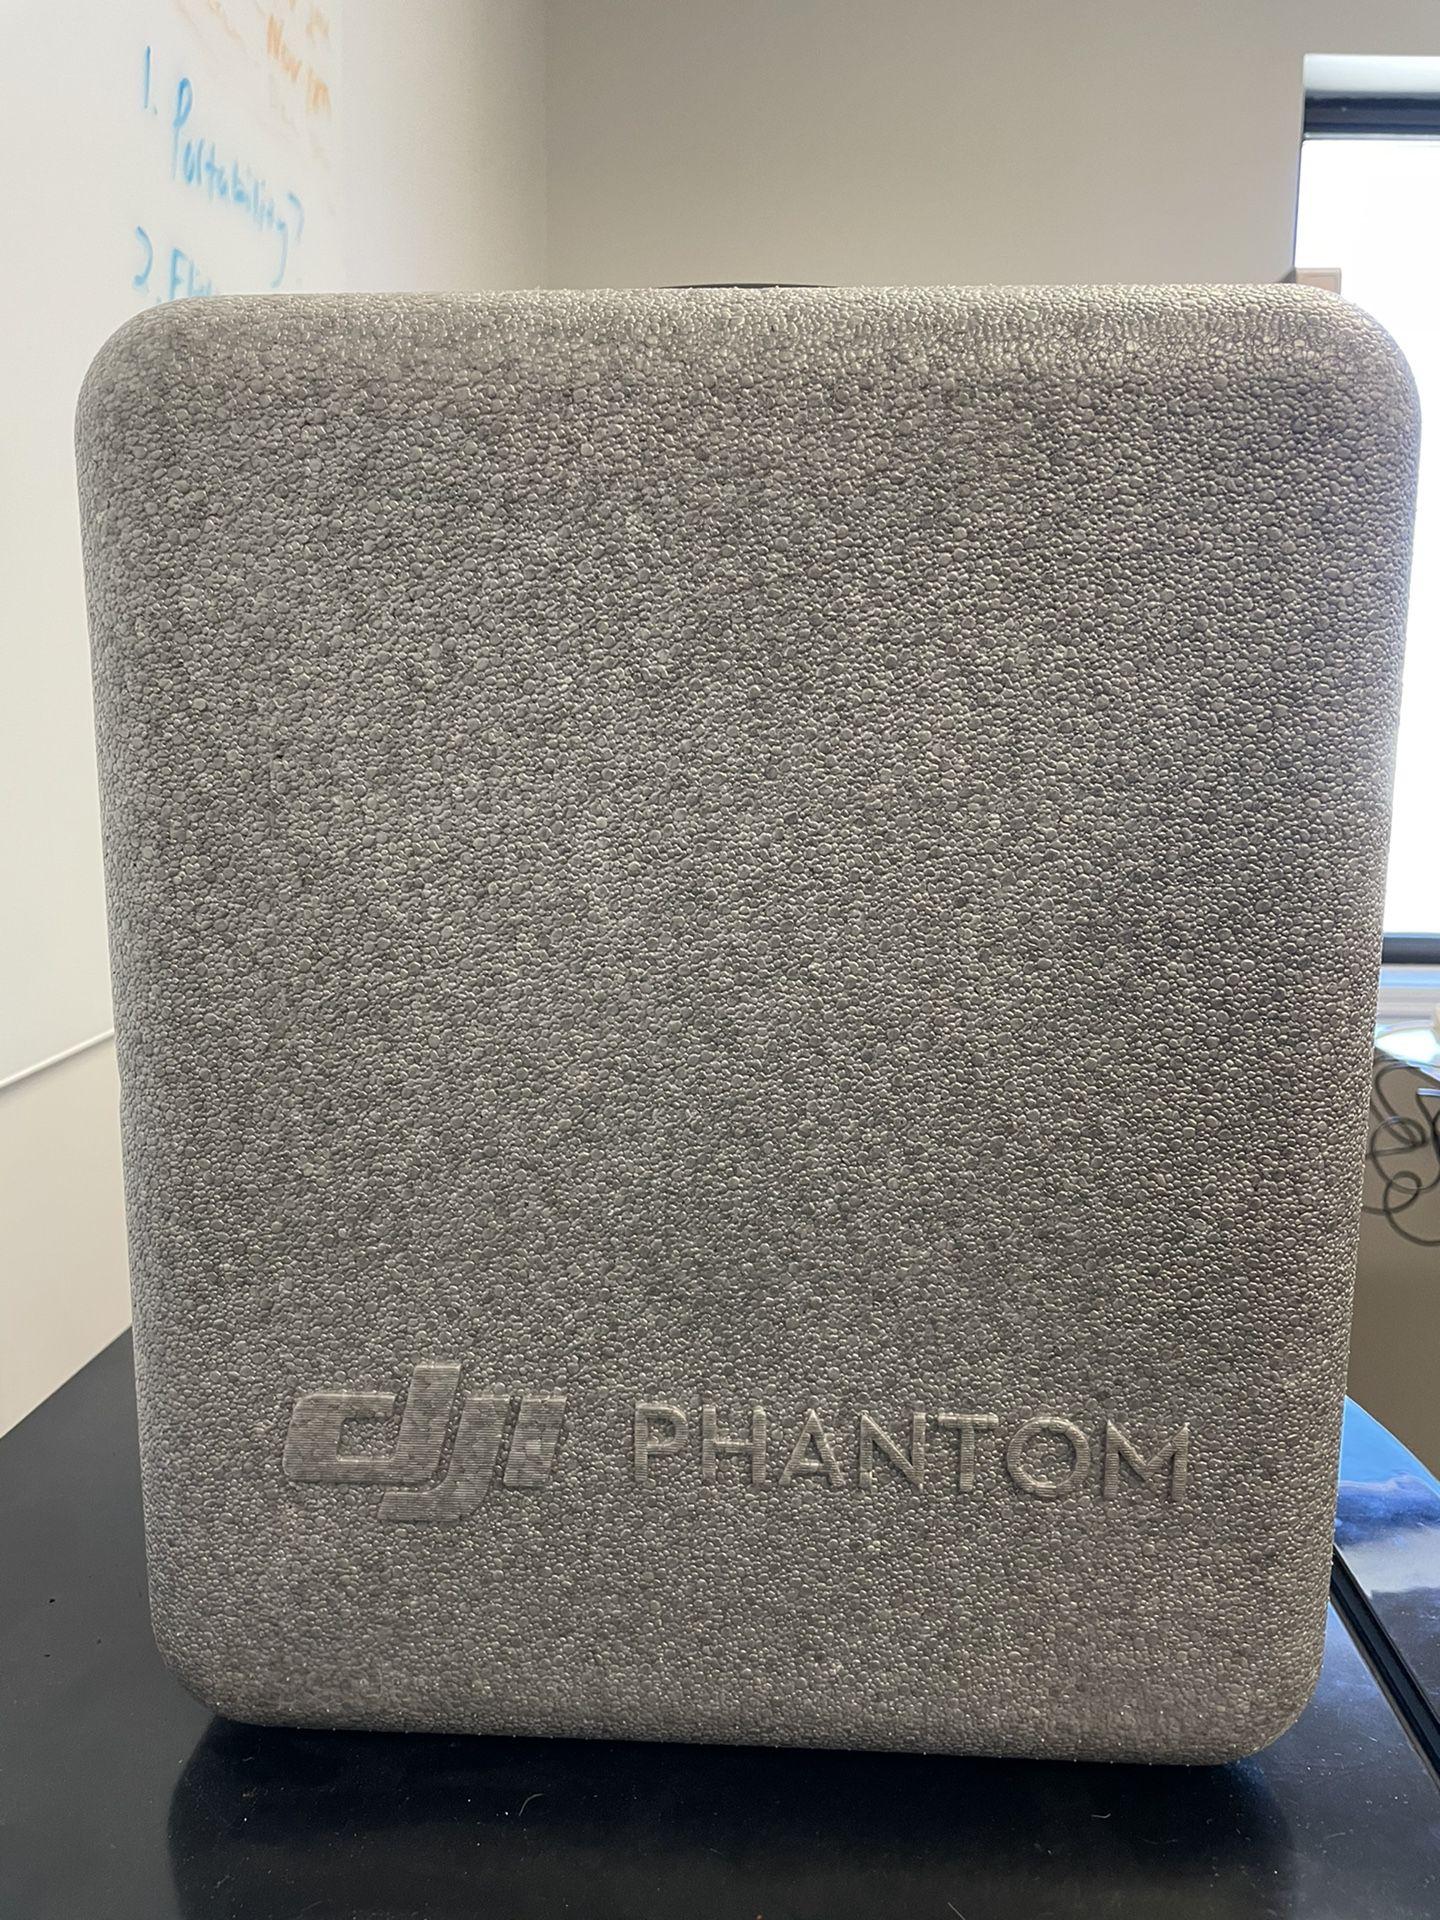 DJI Phamton 4 Pro Case